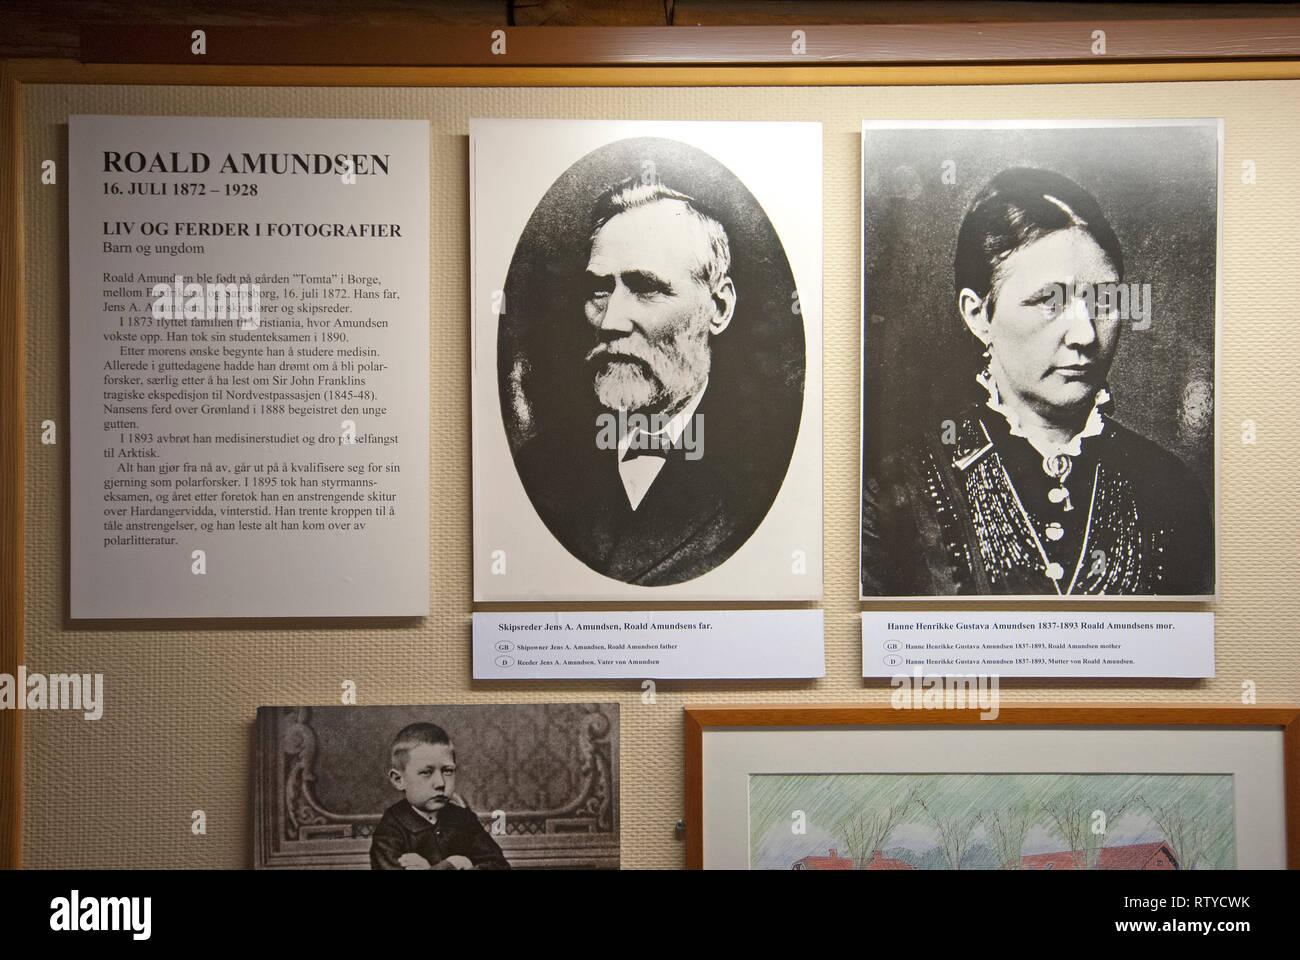 Old b/w photograph of the parents of norwegian explorer Roald Amundsen (1872-1928), Polar Museum (Polarmuseet) in Tromso, Troms County, Norway - Stock Image